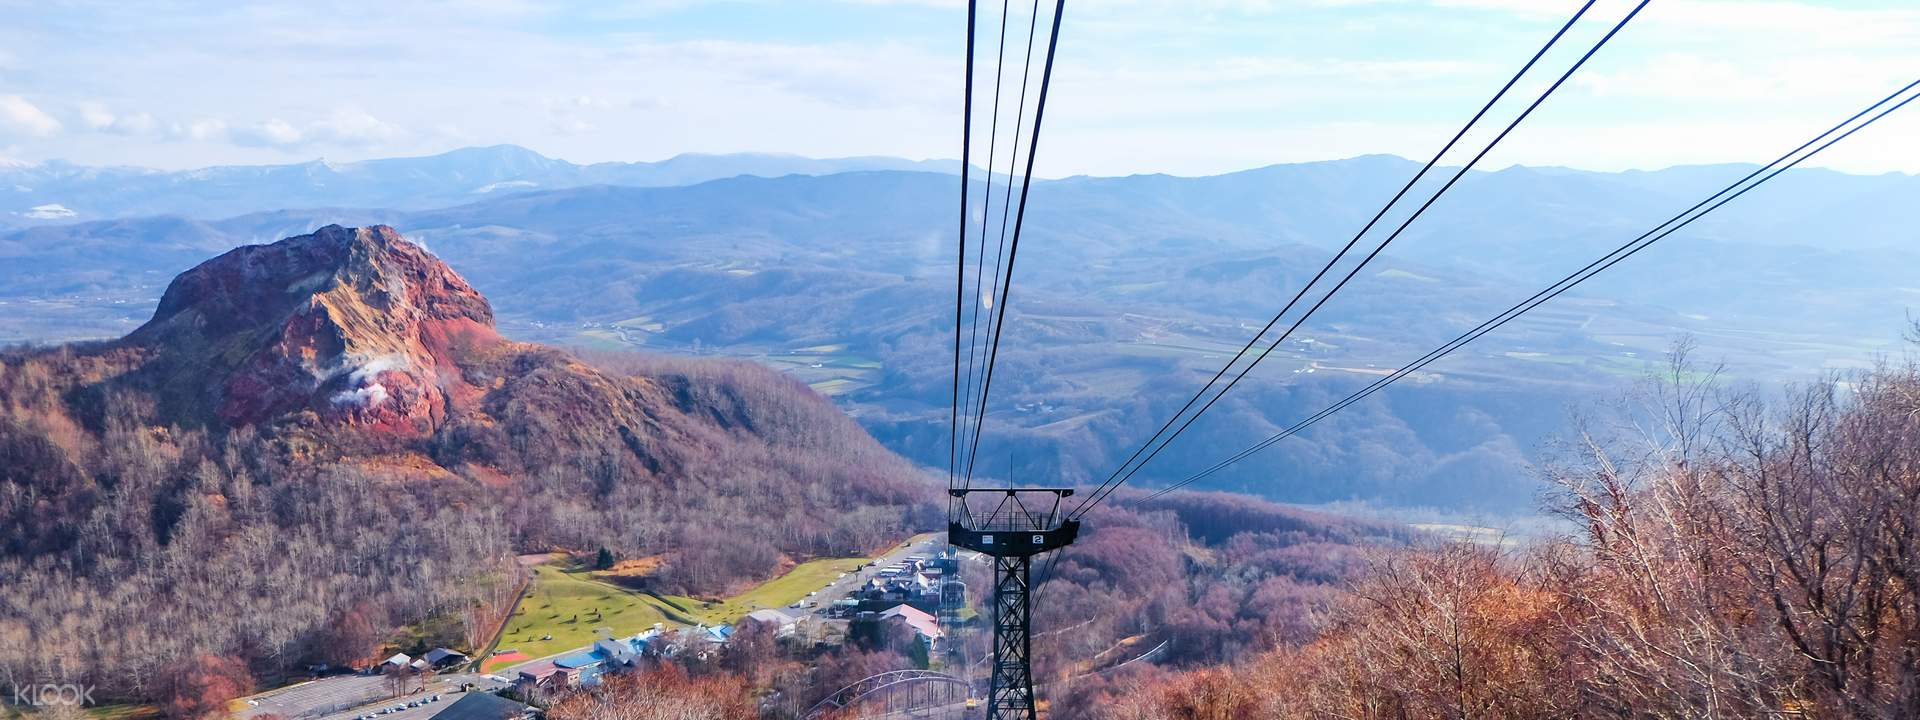 Usuzan Ropeway Round Trip Ticket Hokkaido, Japan - Klook